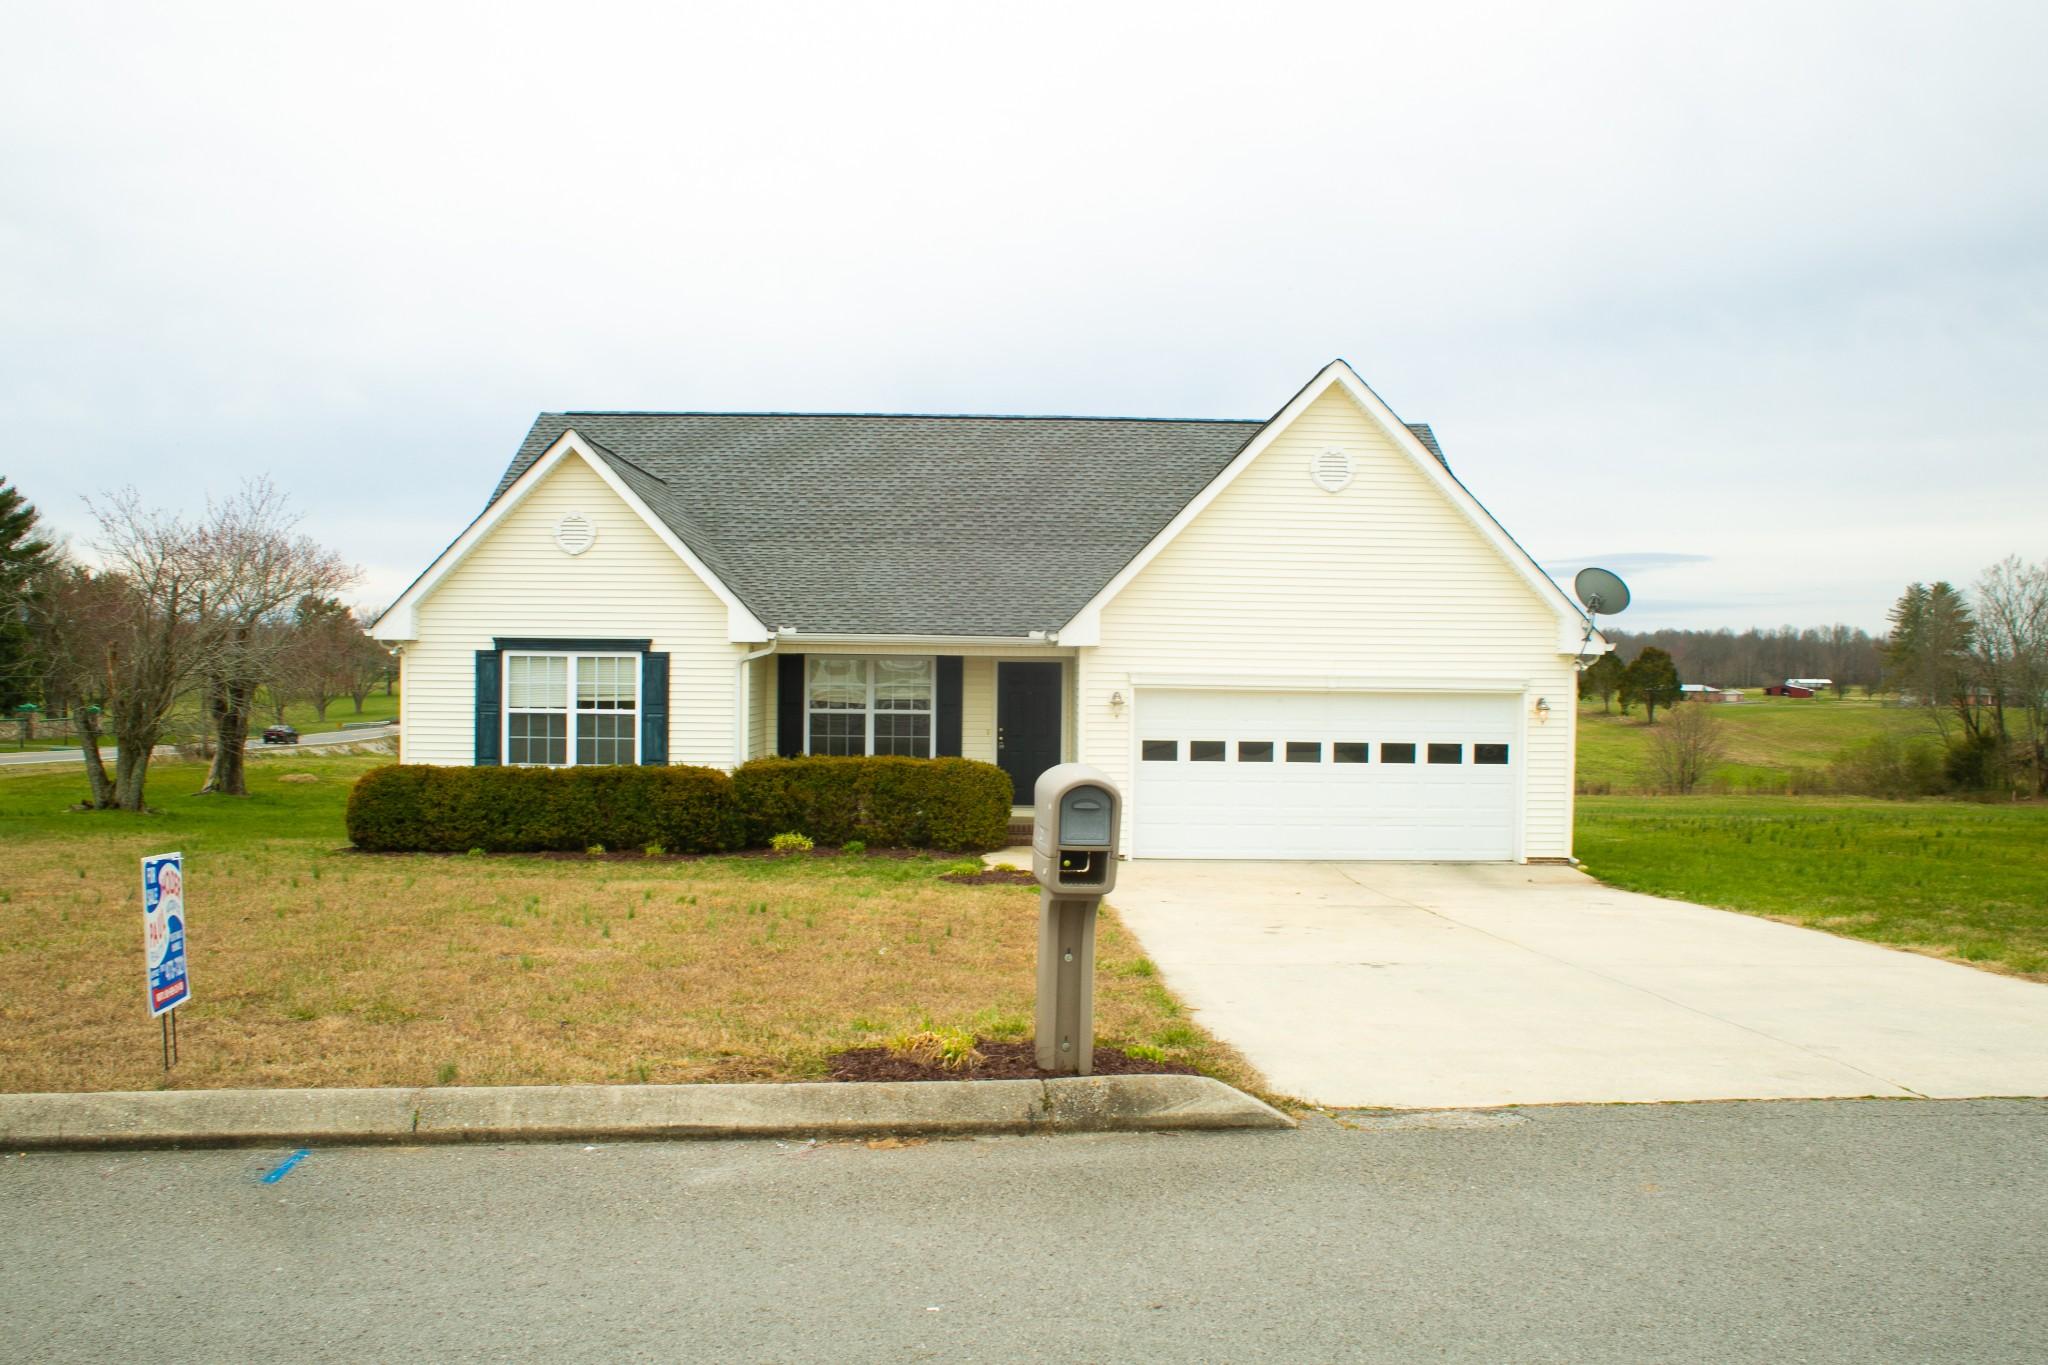 21 Maple Ridge Ct, Mc Minnville, TN 37110 - Mc Minnville, TN real estate listing